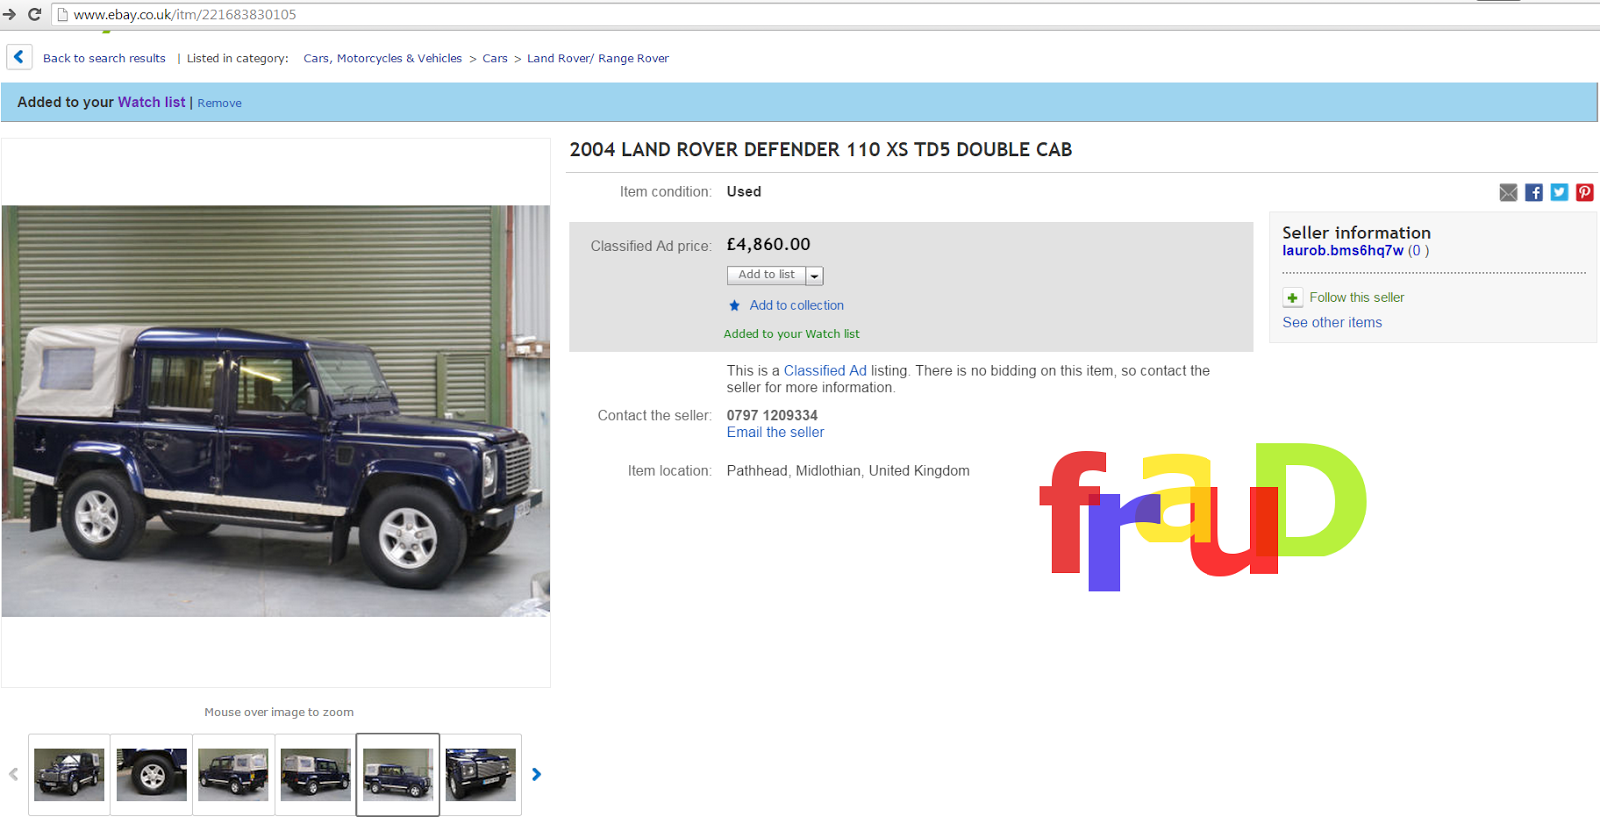 Ebay scam : 2004 land rover defender 110 - yf04huh - fraud - yf04 ...